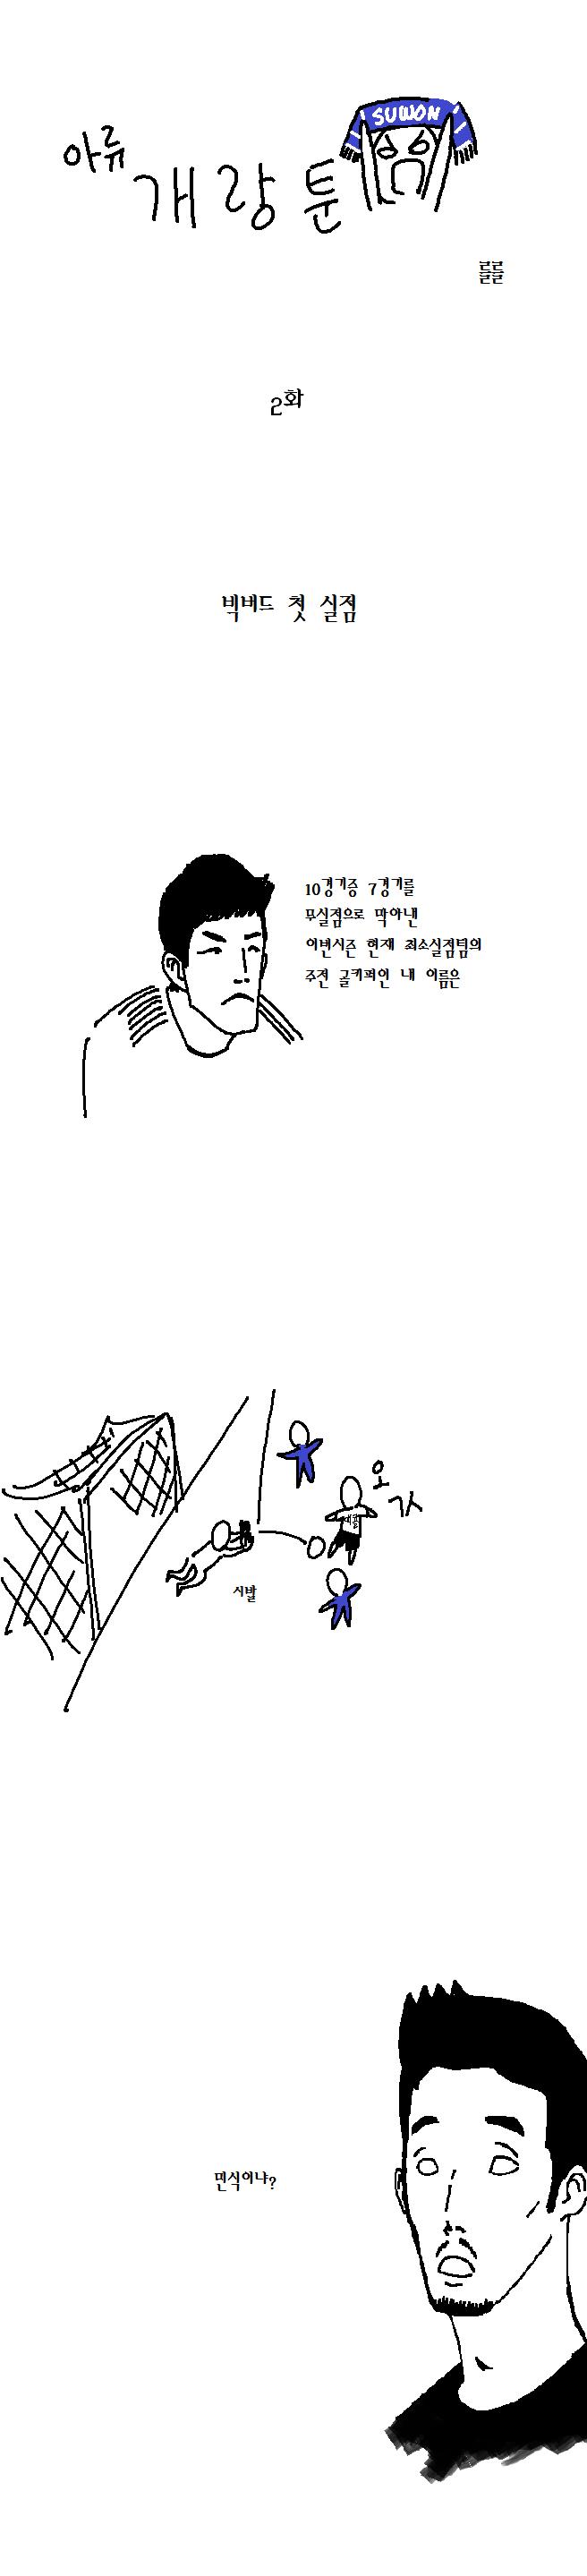 1.png : 아류 개랑툰 2화